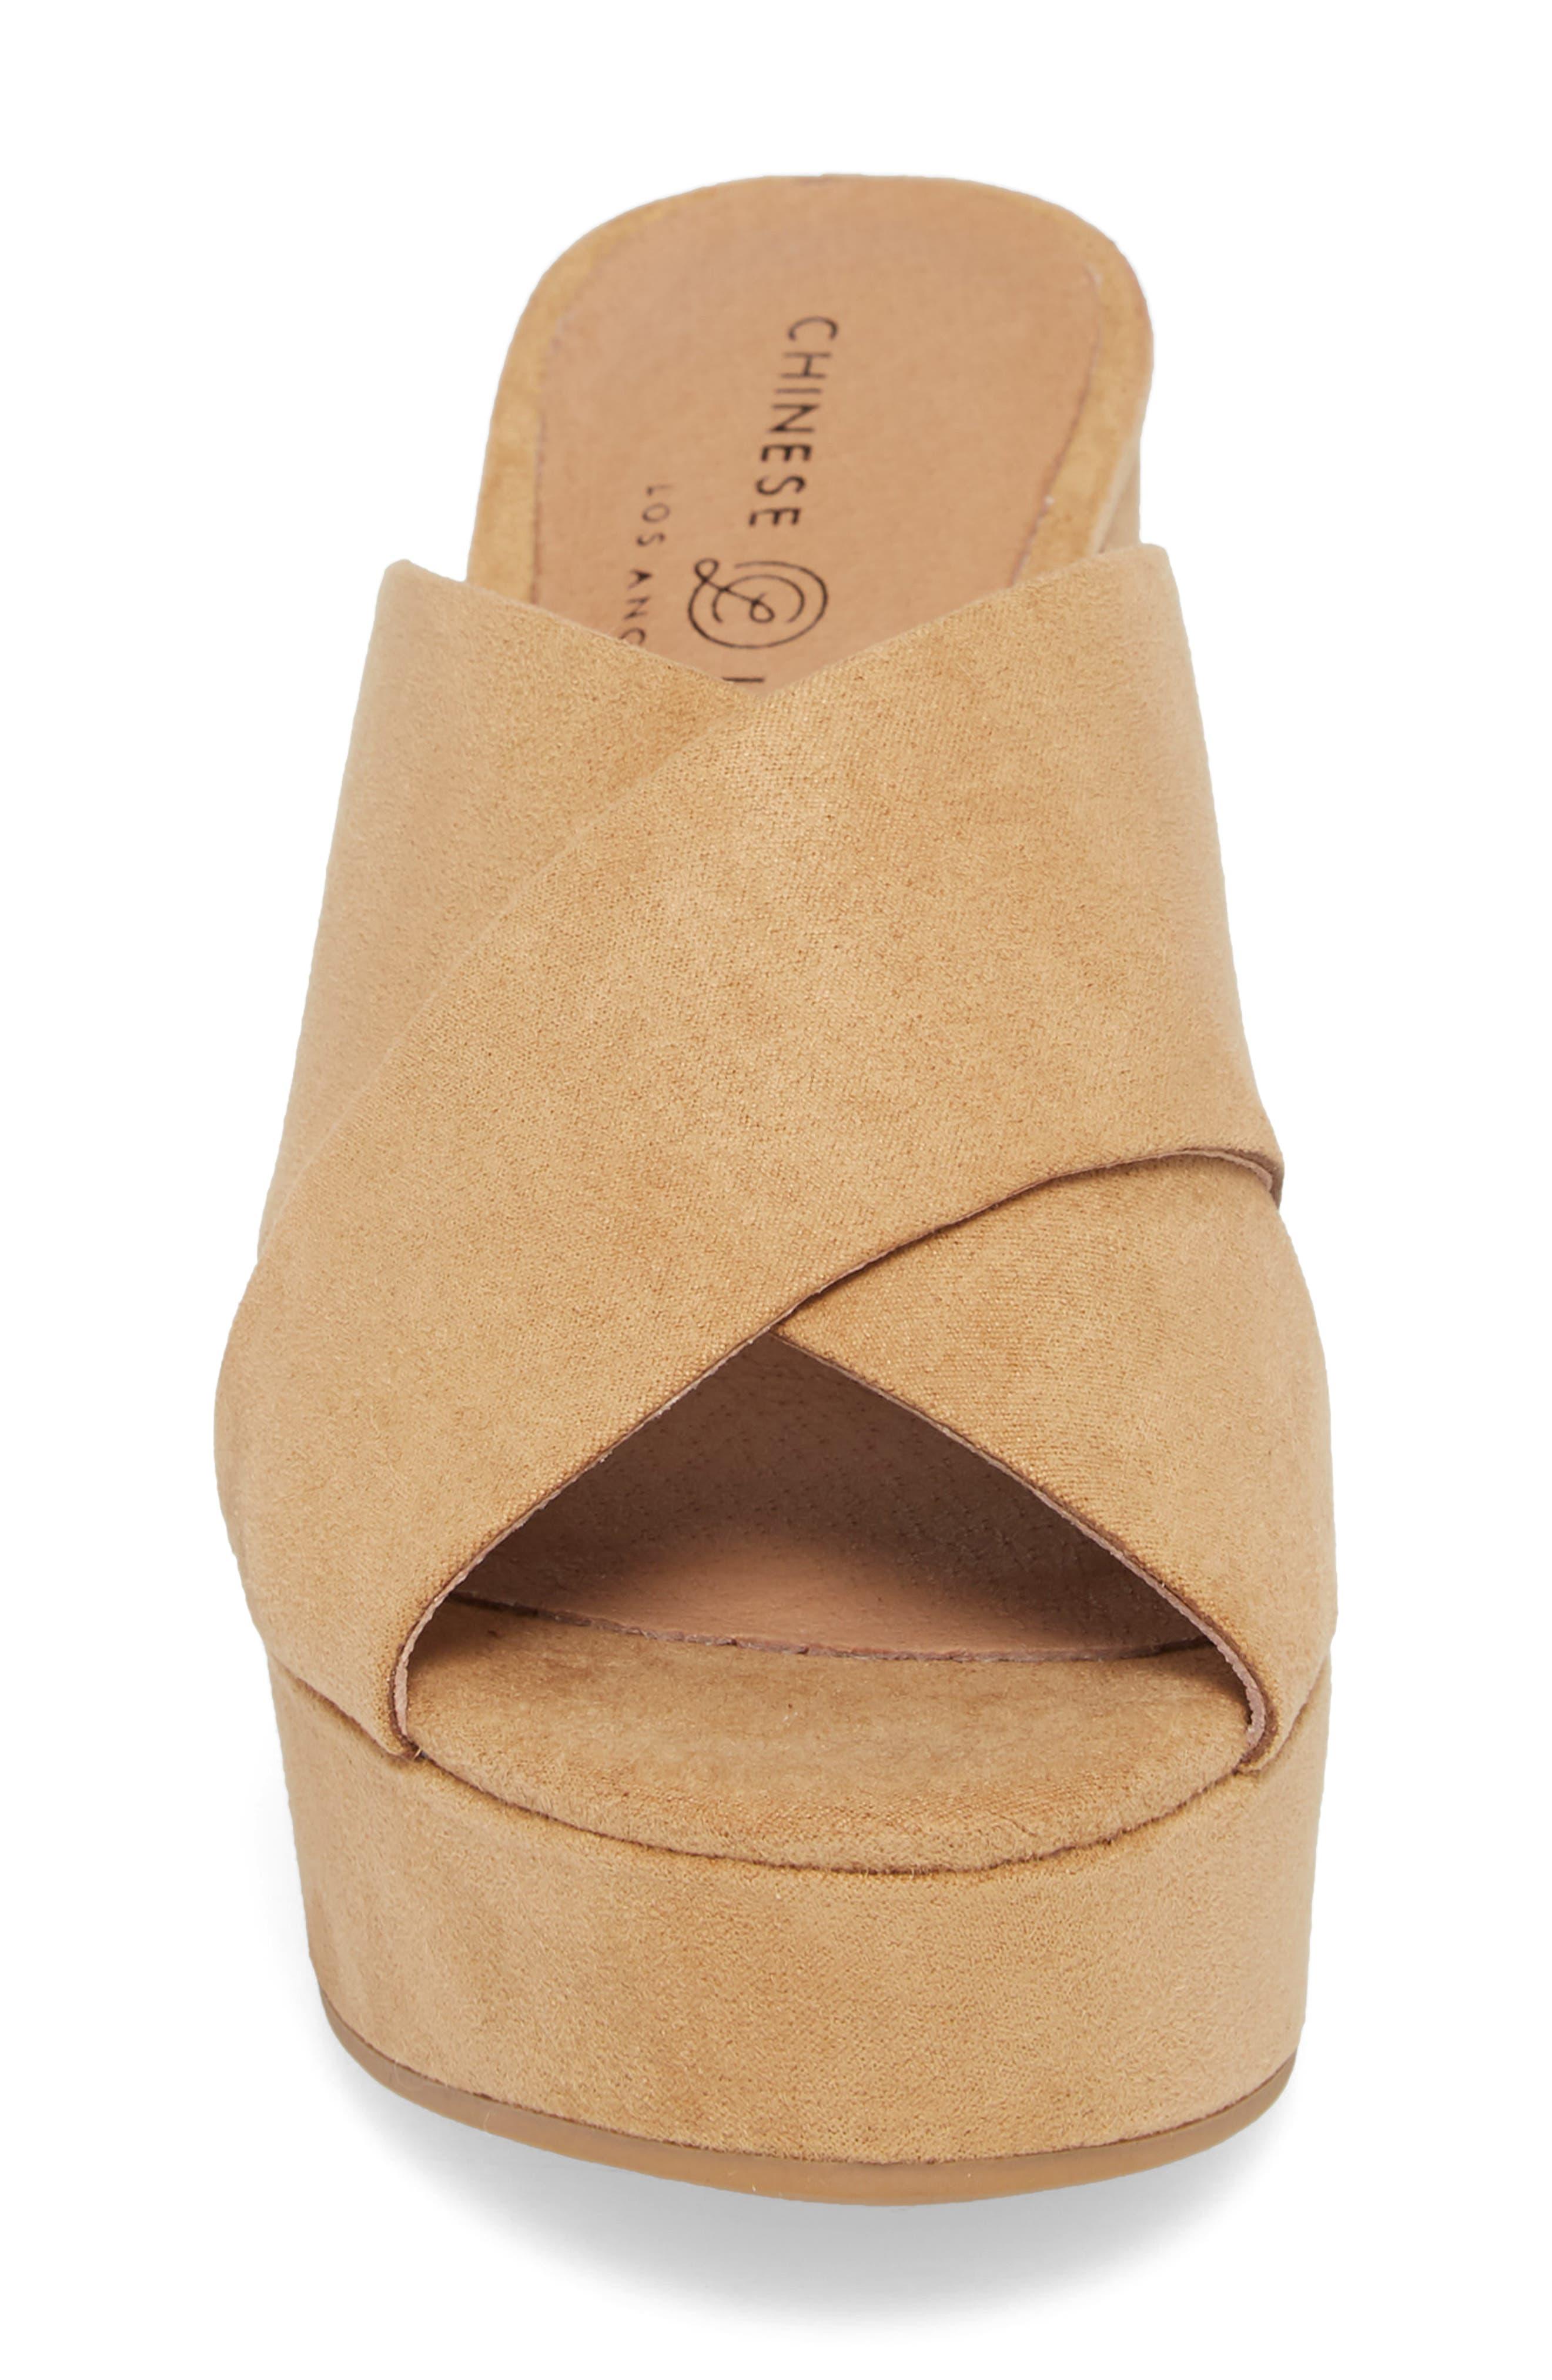 Teagan Cross Strap Platform Sandal,                             Alternate thumbnail 4, color,                             Camel